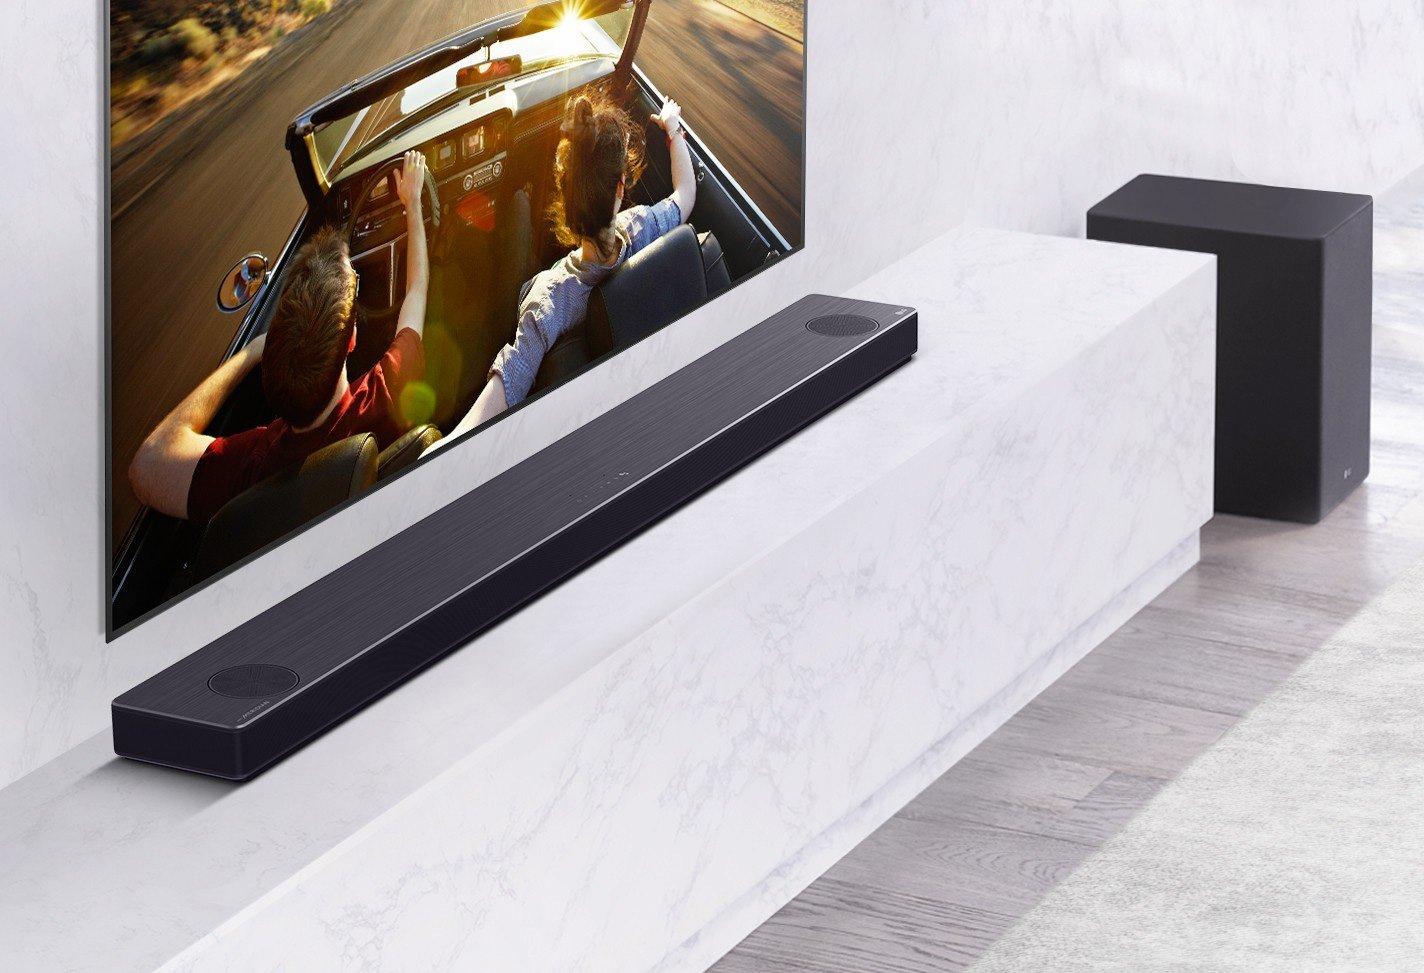 LG Introduces AI-Powered Soundbars at werd.com